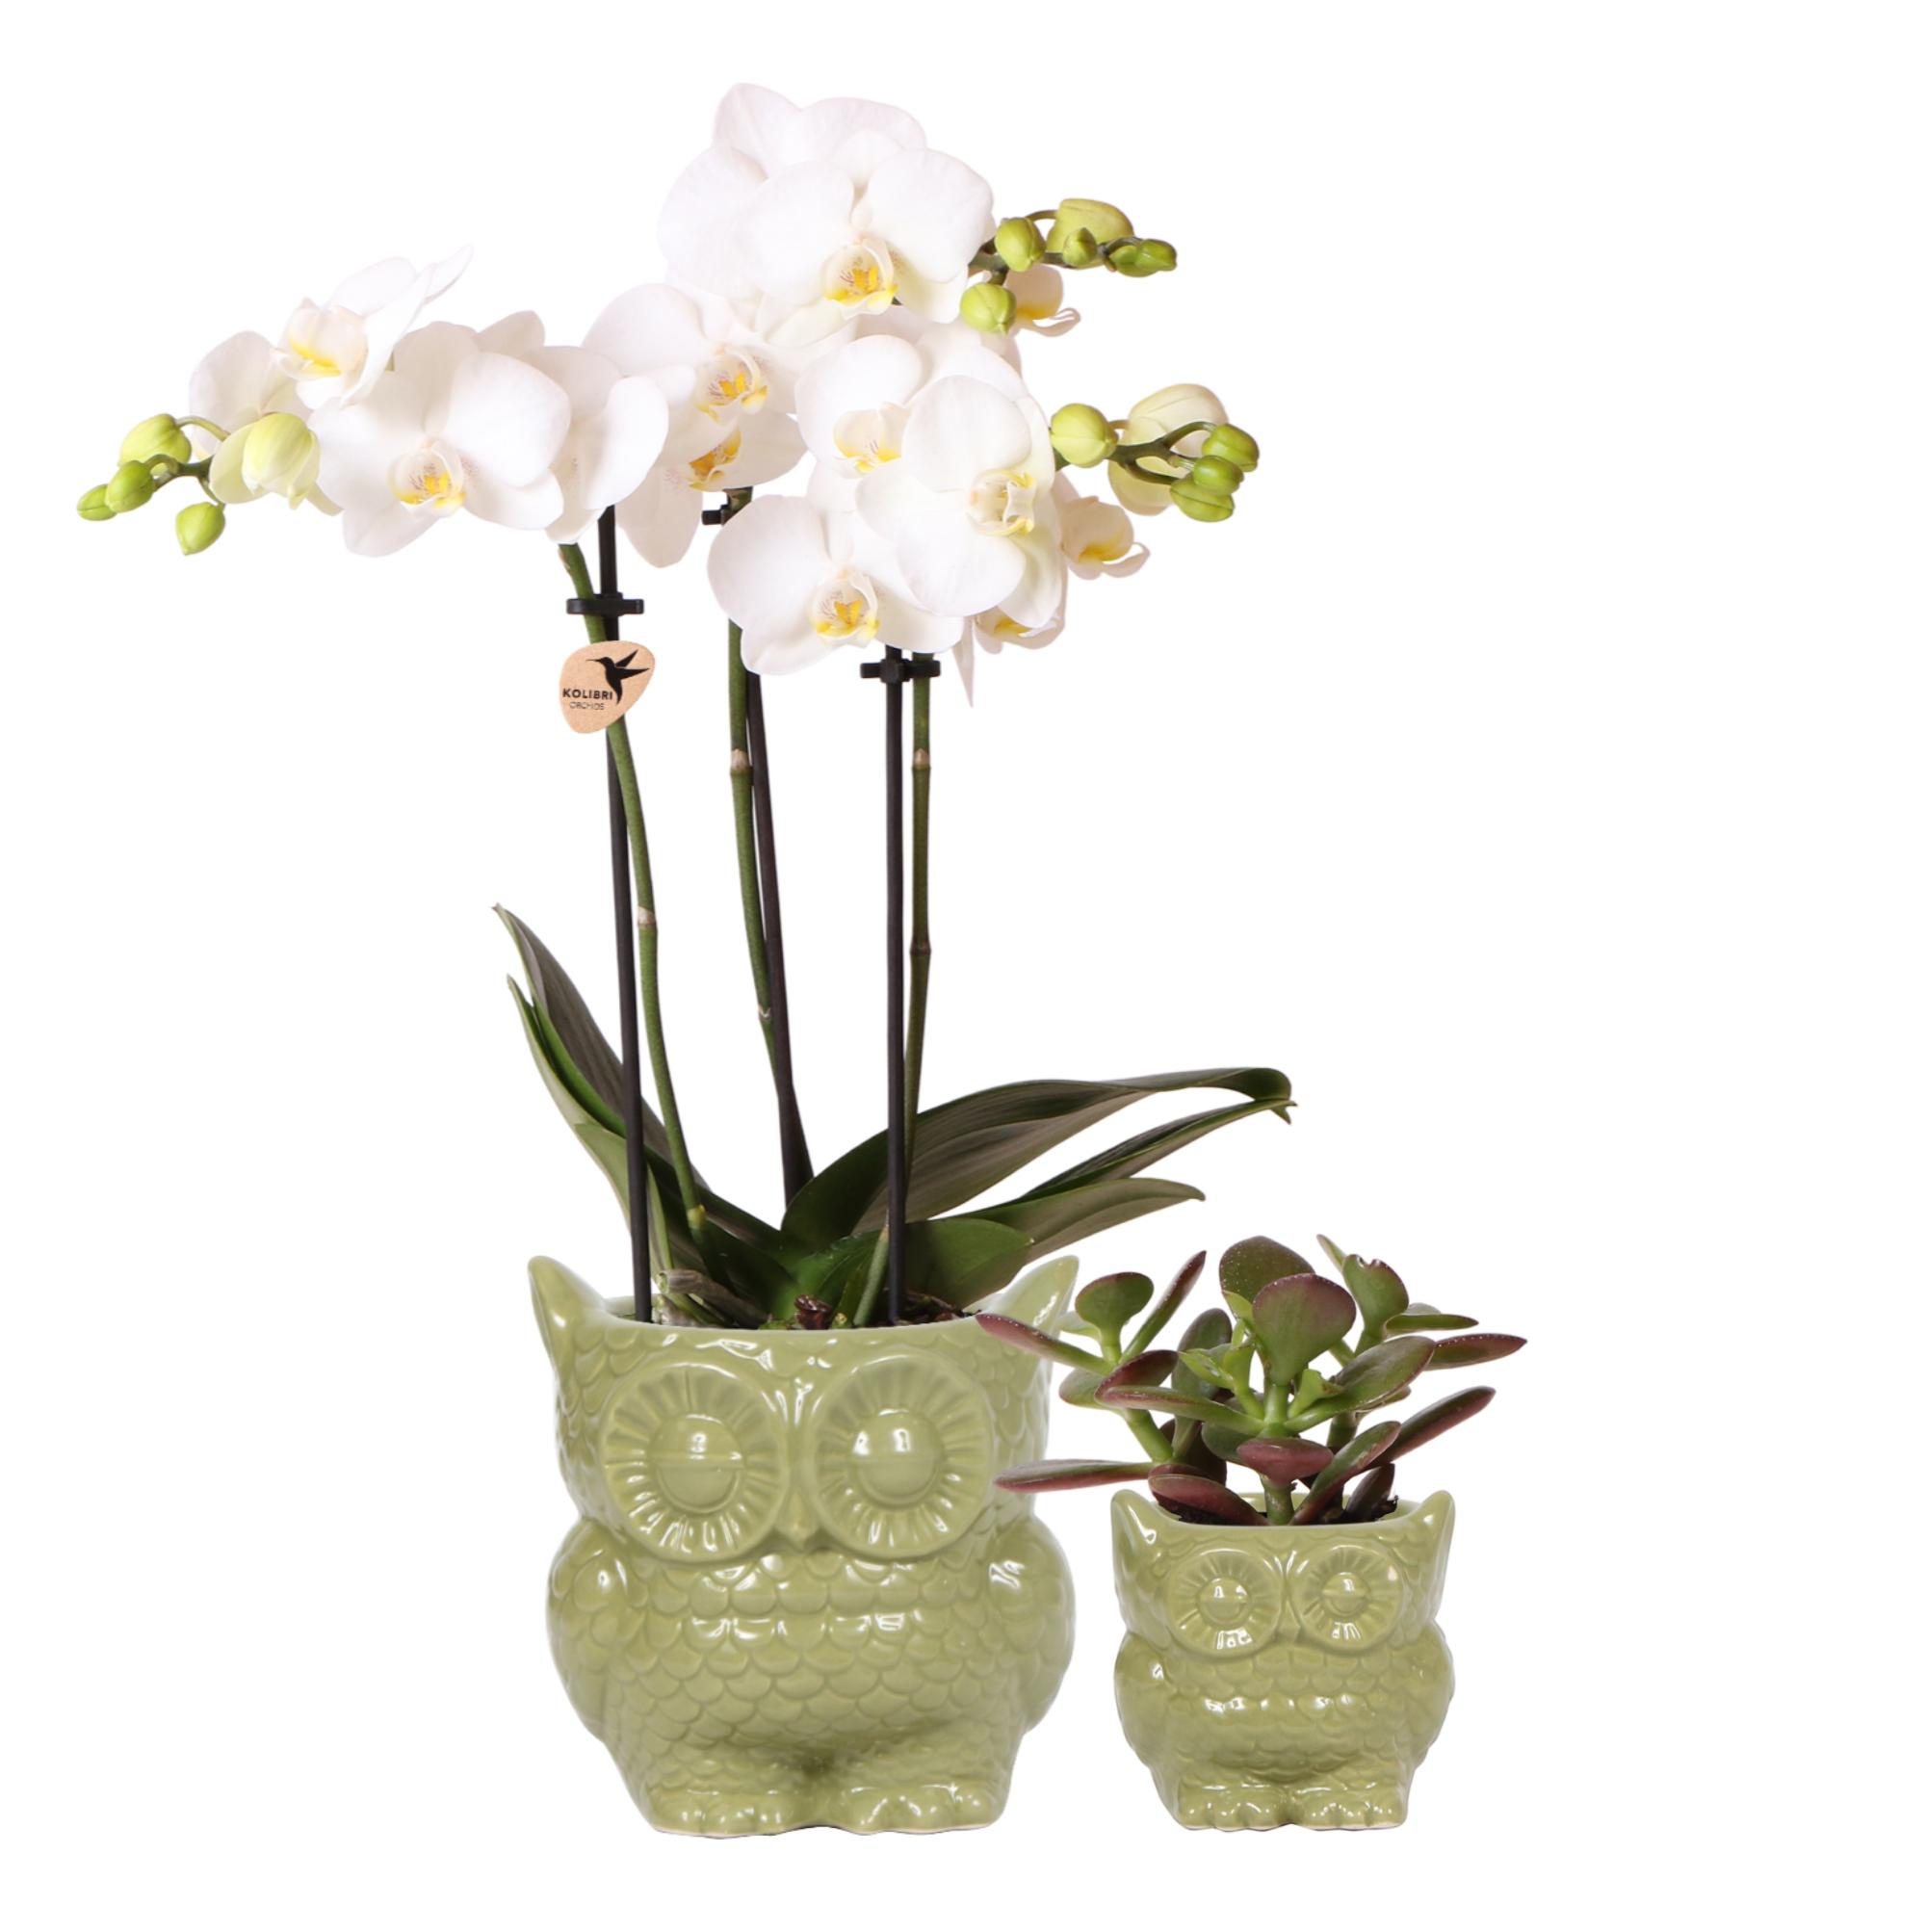 Kolibri orchids greens plantenset van orchidee phalaenopsis en succulent in owl pot green 6cm 9cm